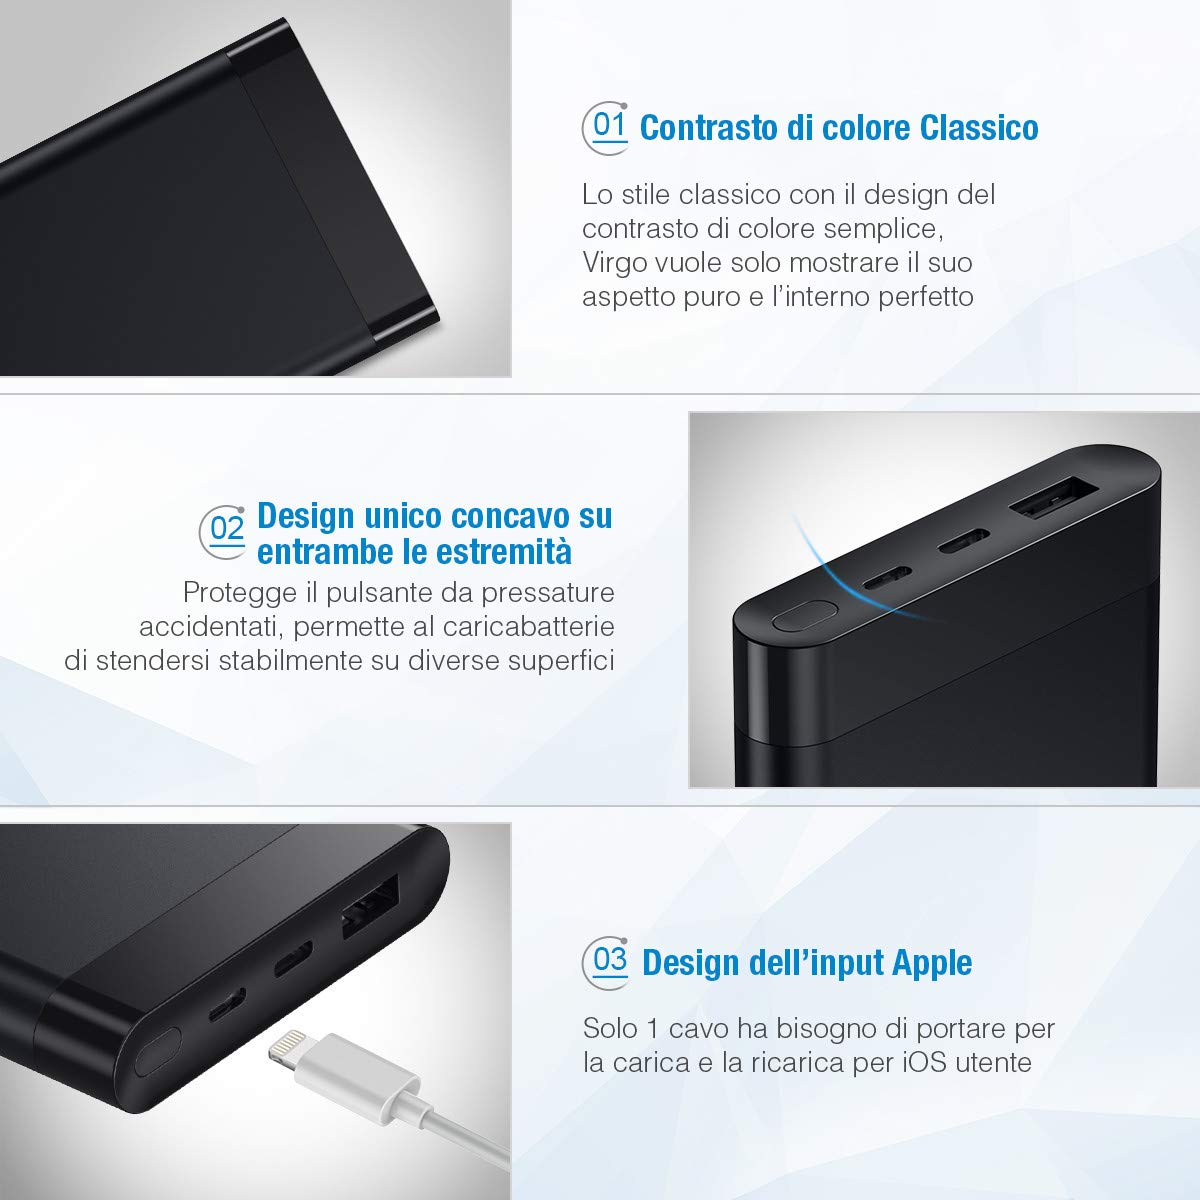 Poweradd Virgo II Powerbank Batteria Portatile 10000mAh con 2 Uscite, Caricabatterie Portatile con display LED, Entrata Lightning + Type-C per iPhone X / 8 / 7 / 6, Samsung S9 / S8 + e tanti altri - Nero